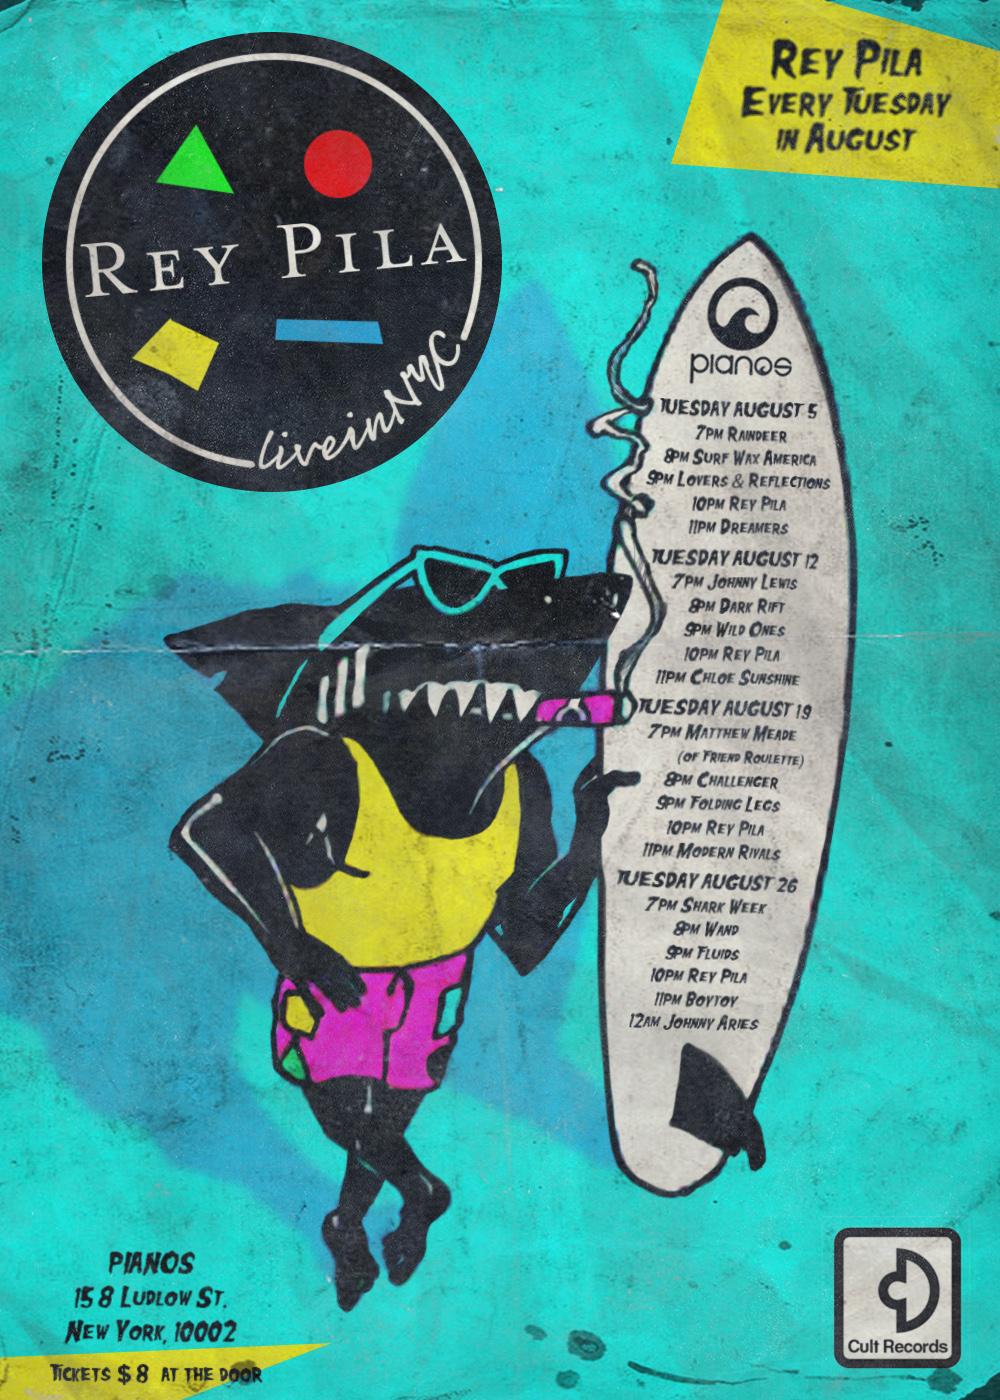 Rey Pila